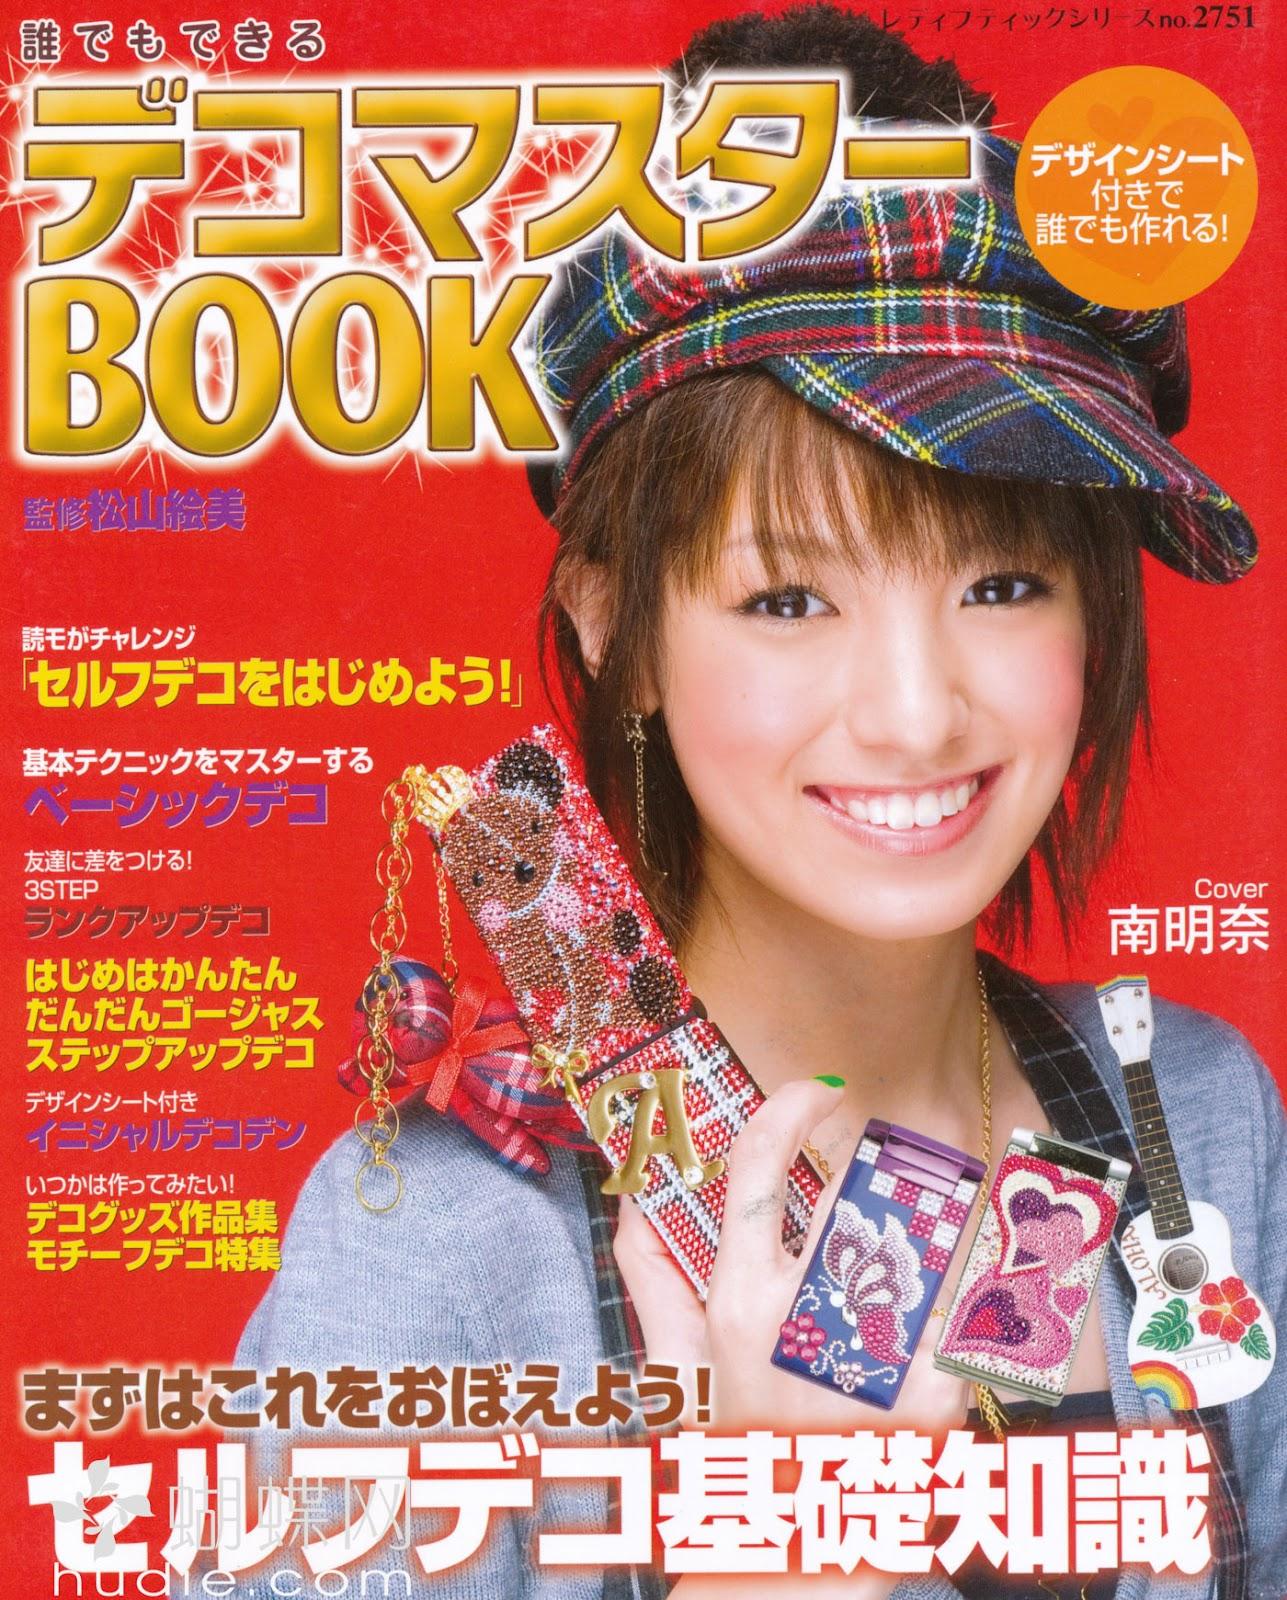 Deco Master (デコマスター) Book japanese magazine scans